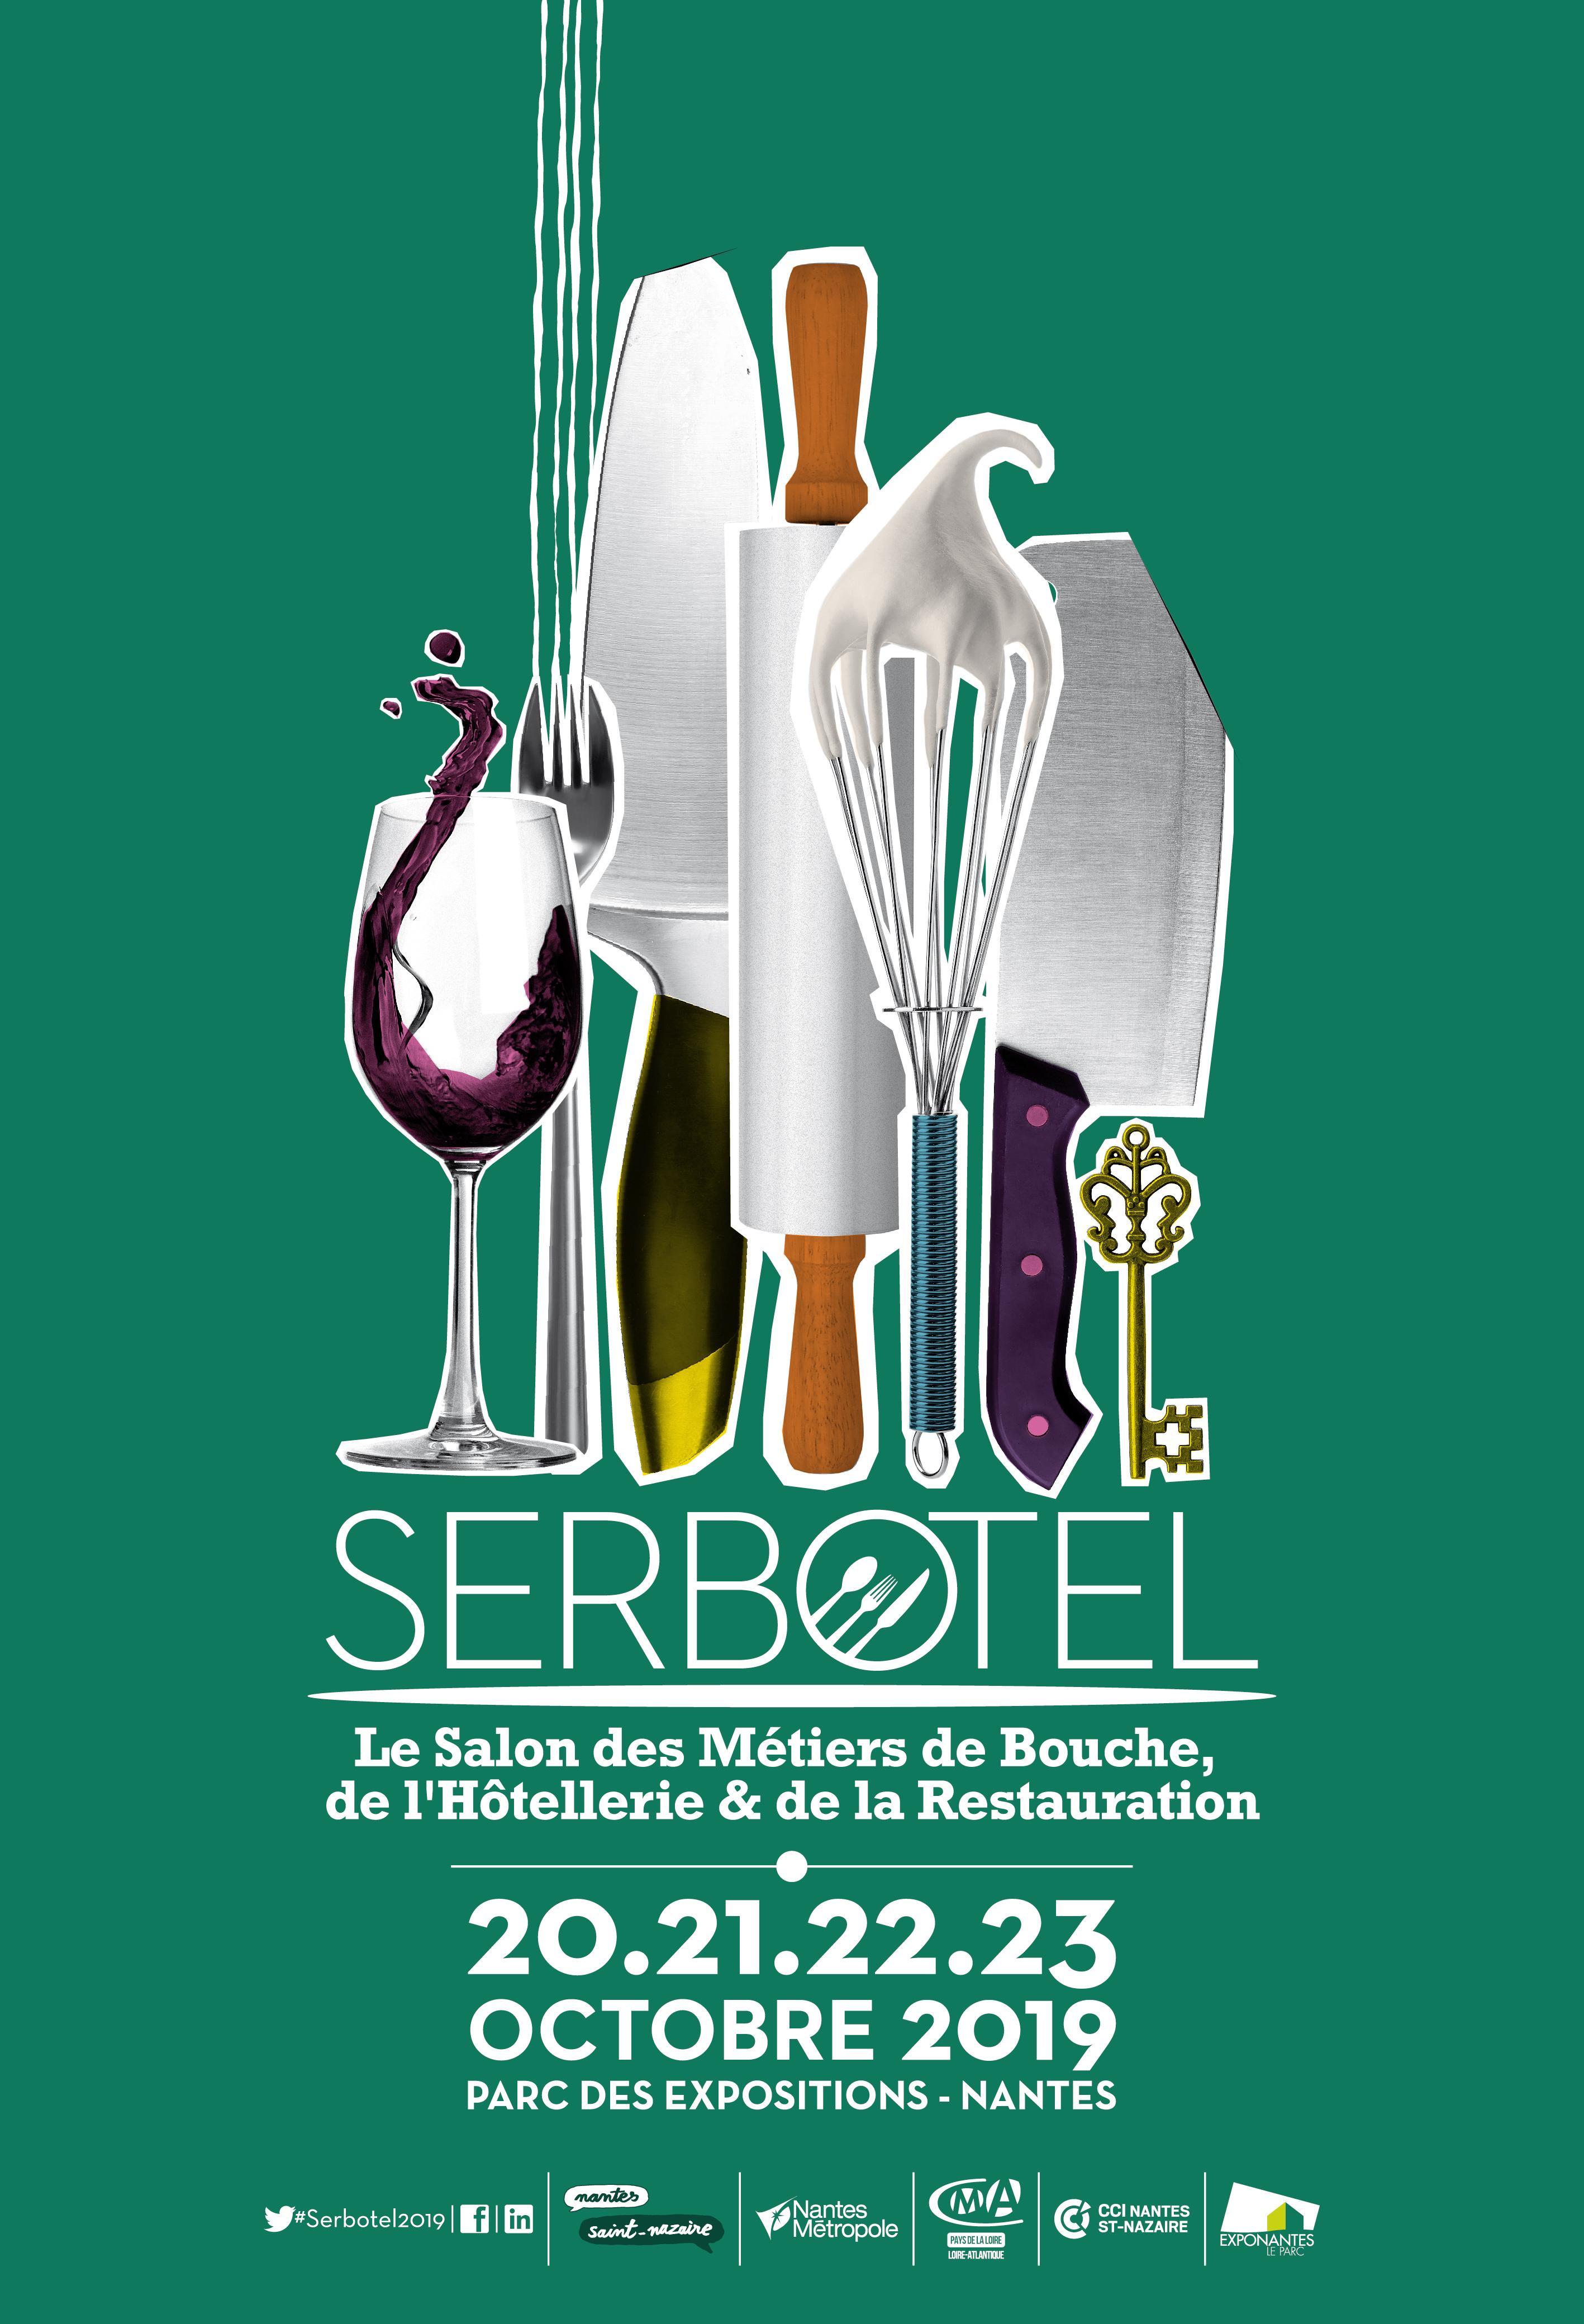 Affiche SERBOTEL - Blog Minoterie Planchot